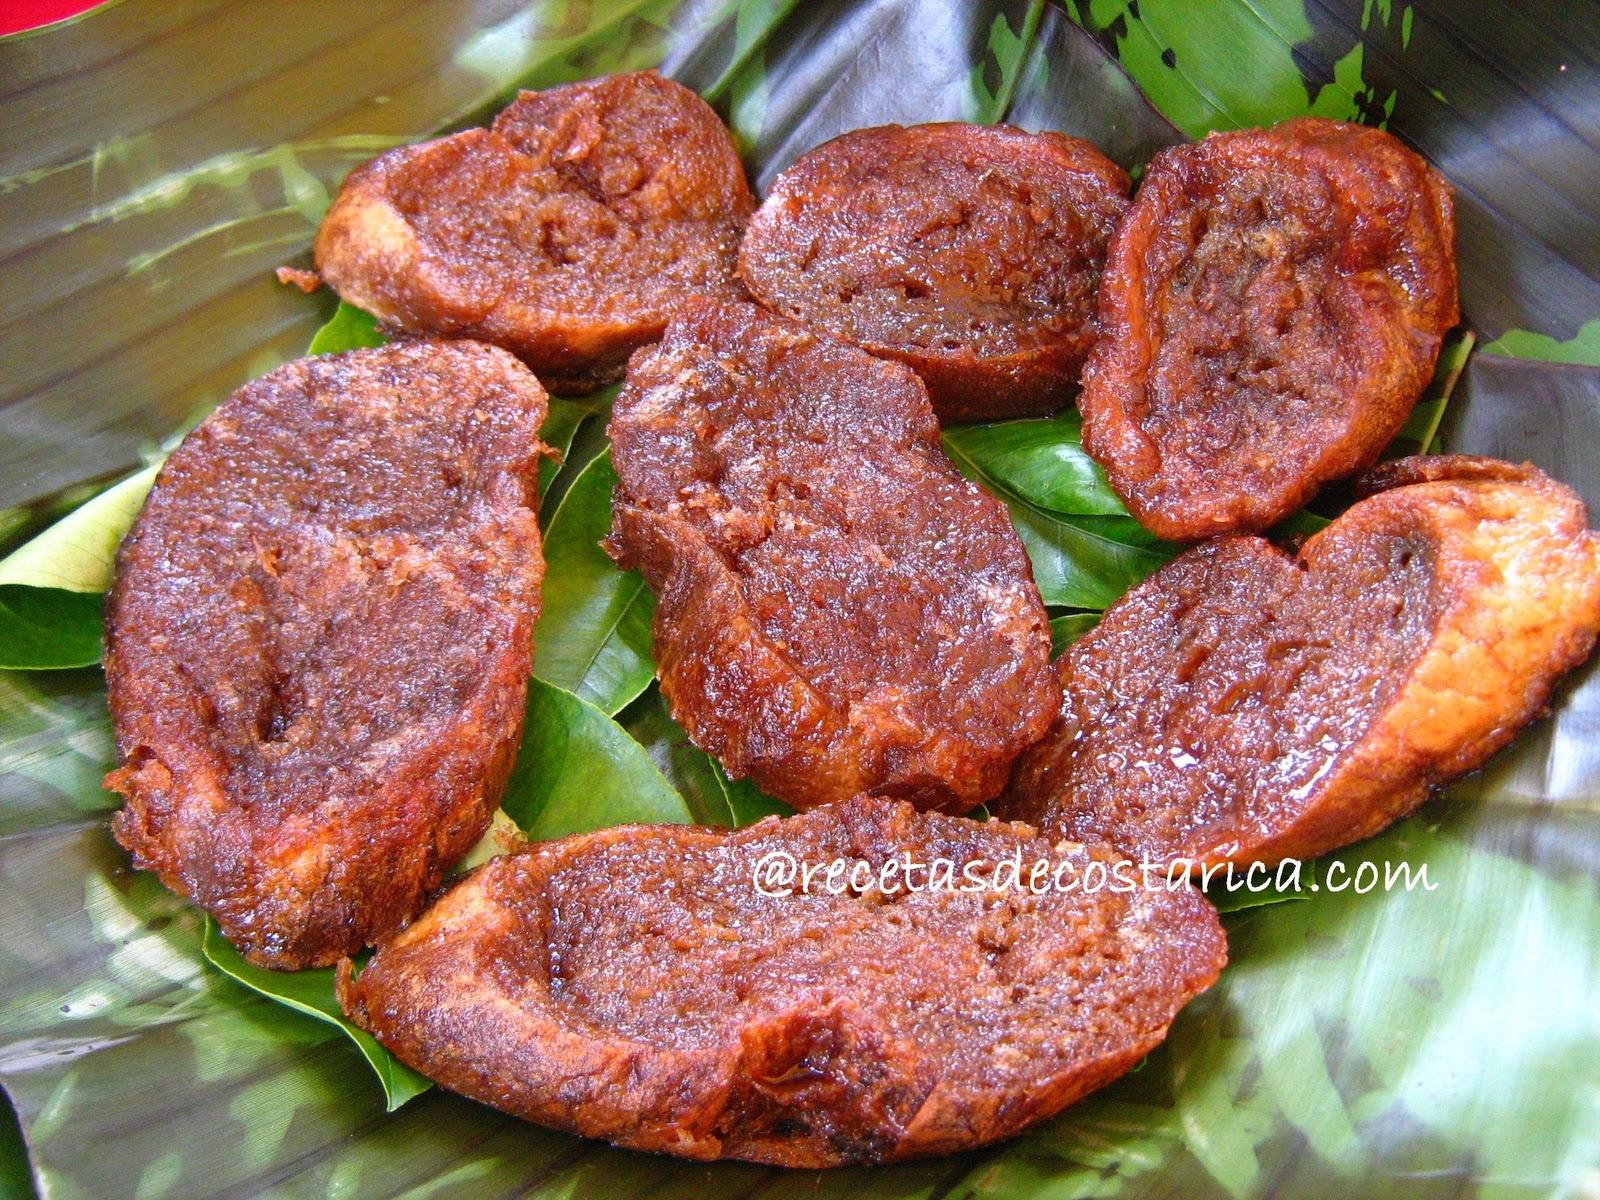 Cocina Costarricense: octubre 2010